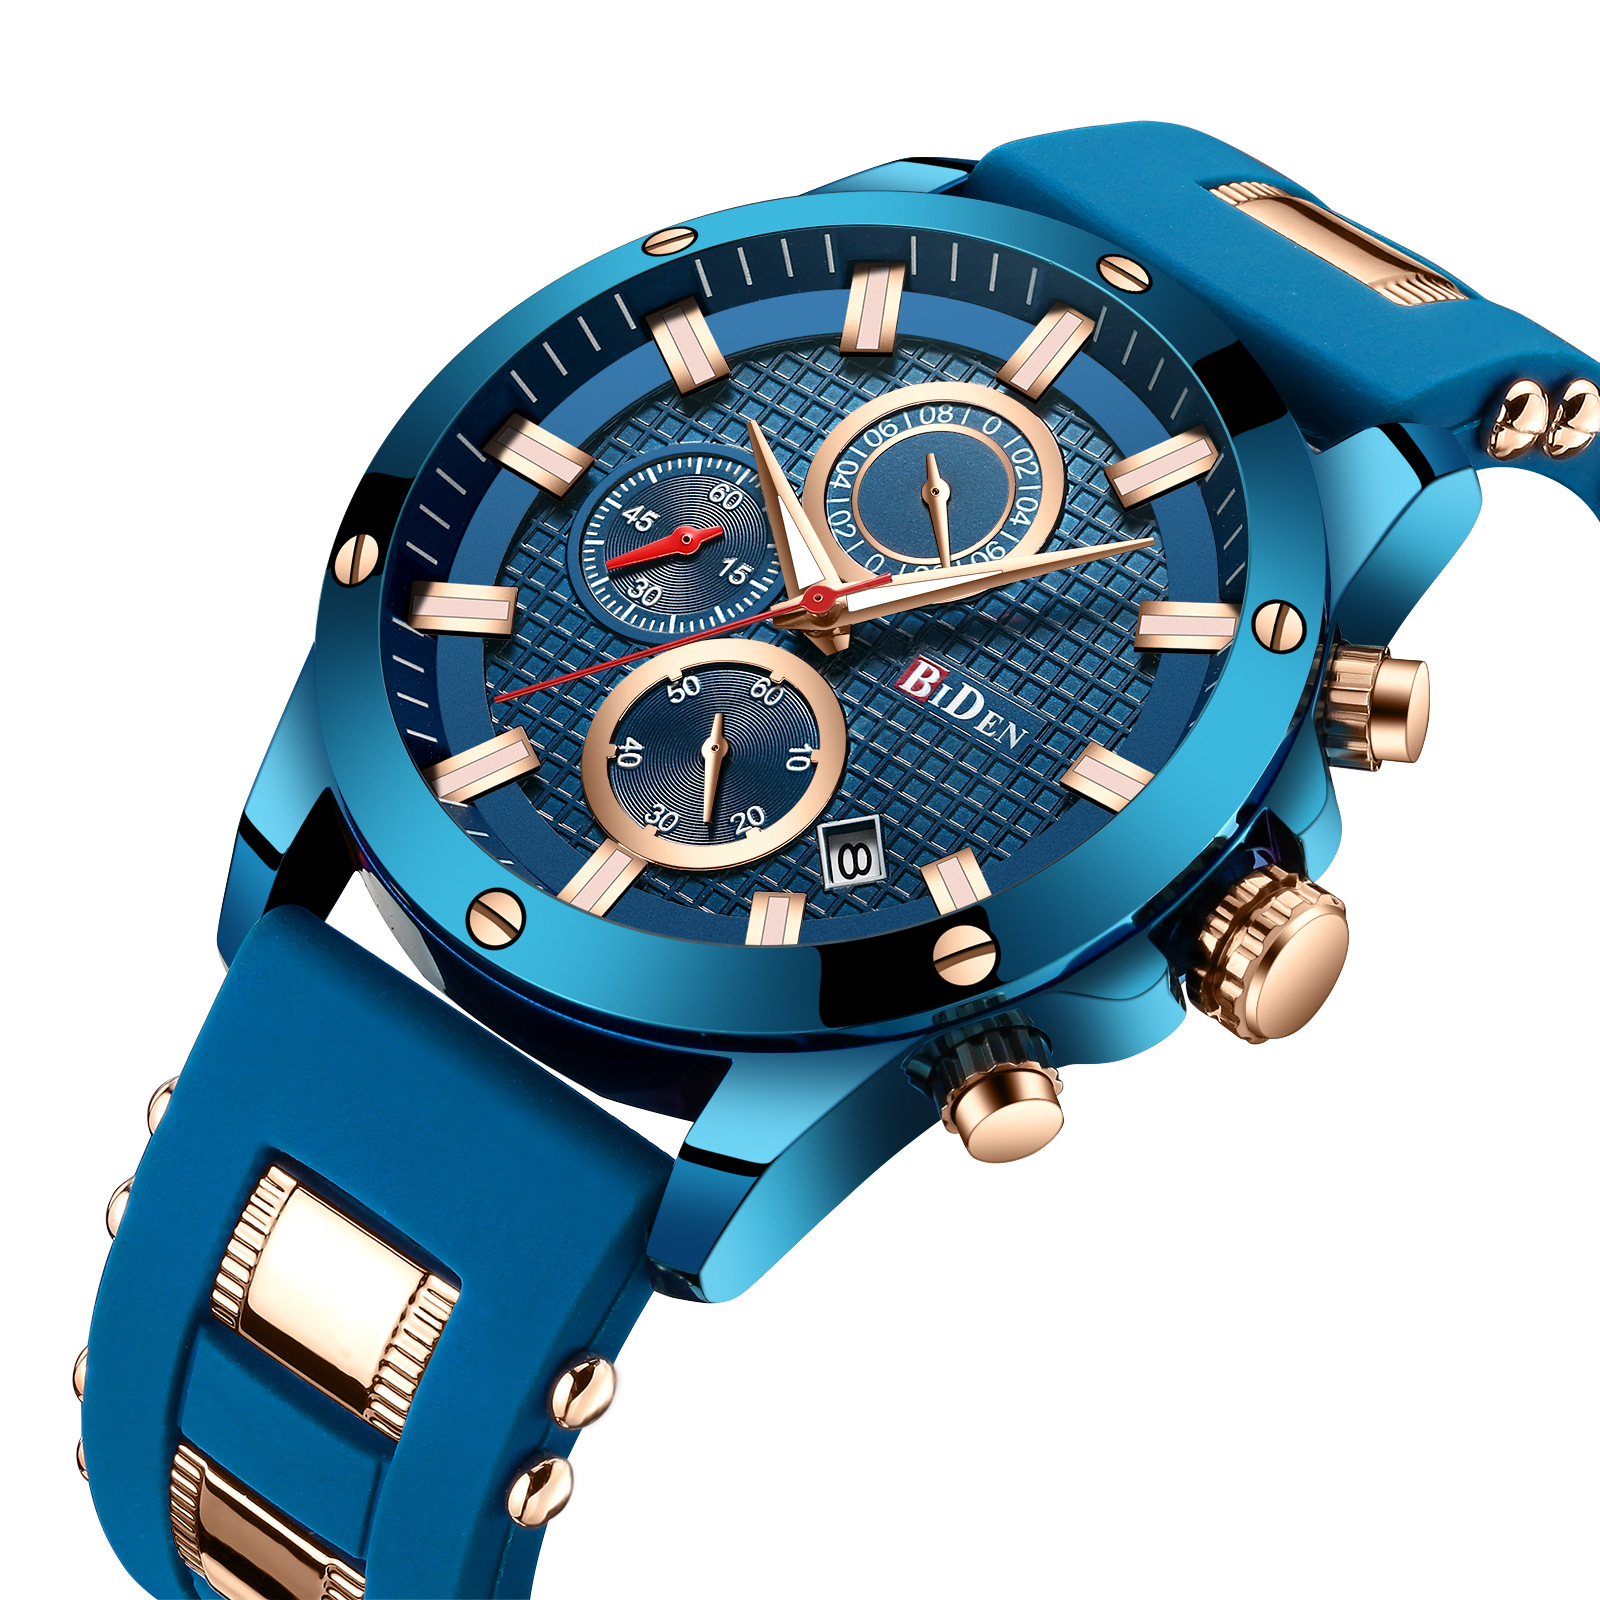 business BIDEN brand man watches waterproof fashion men wristwatches blue quartz Silica gel men's clocks calendar Japan movement